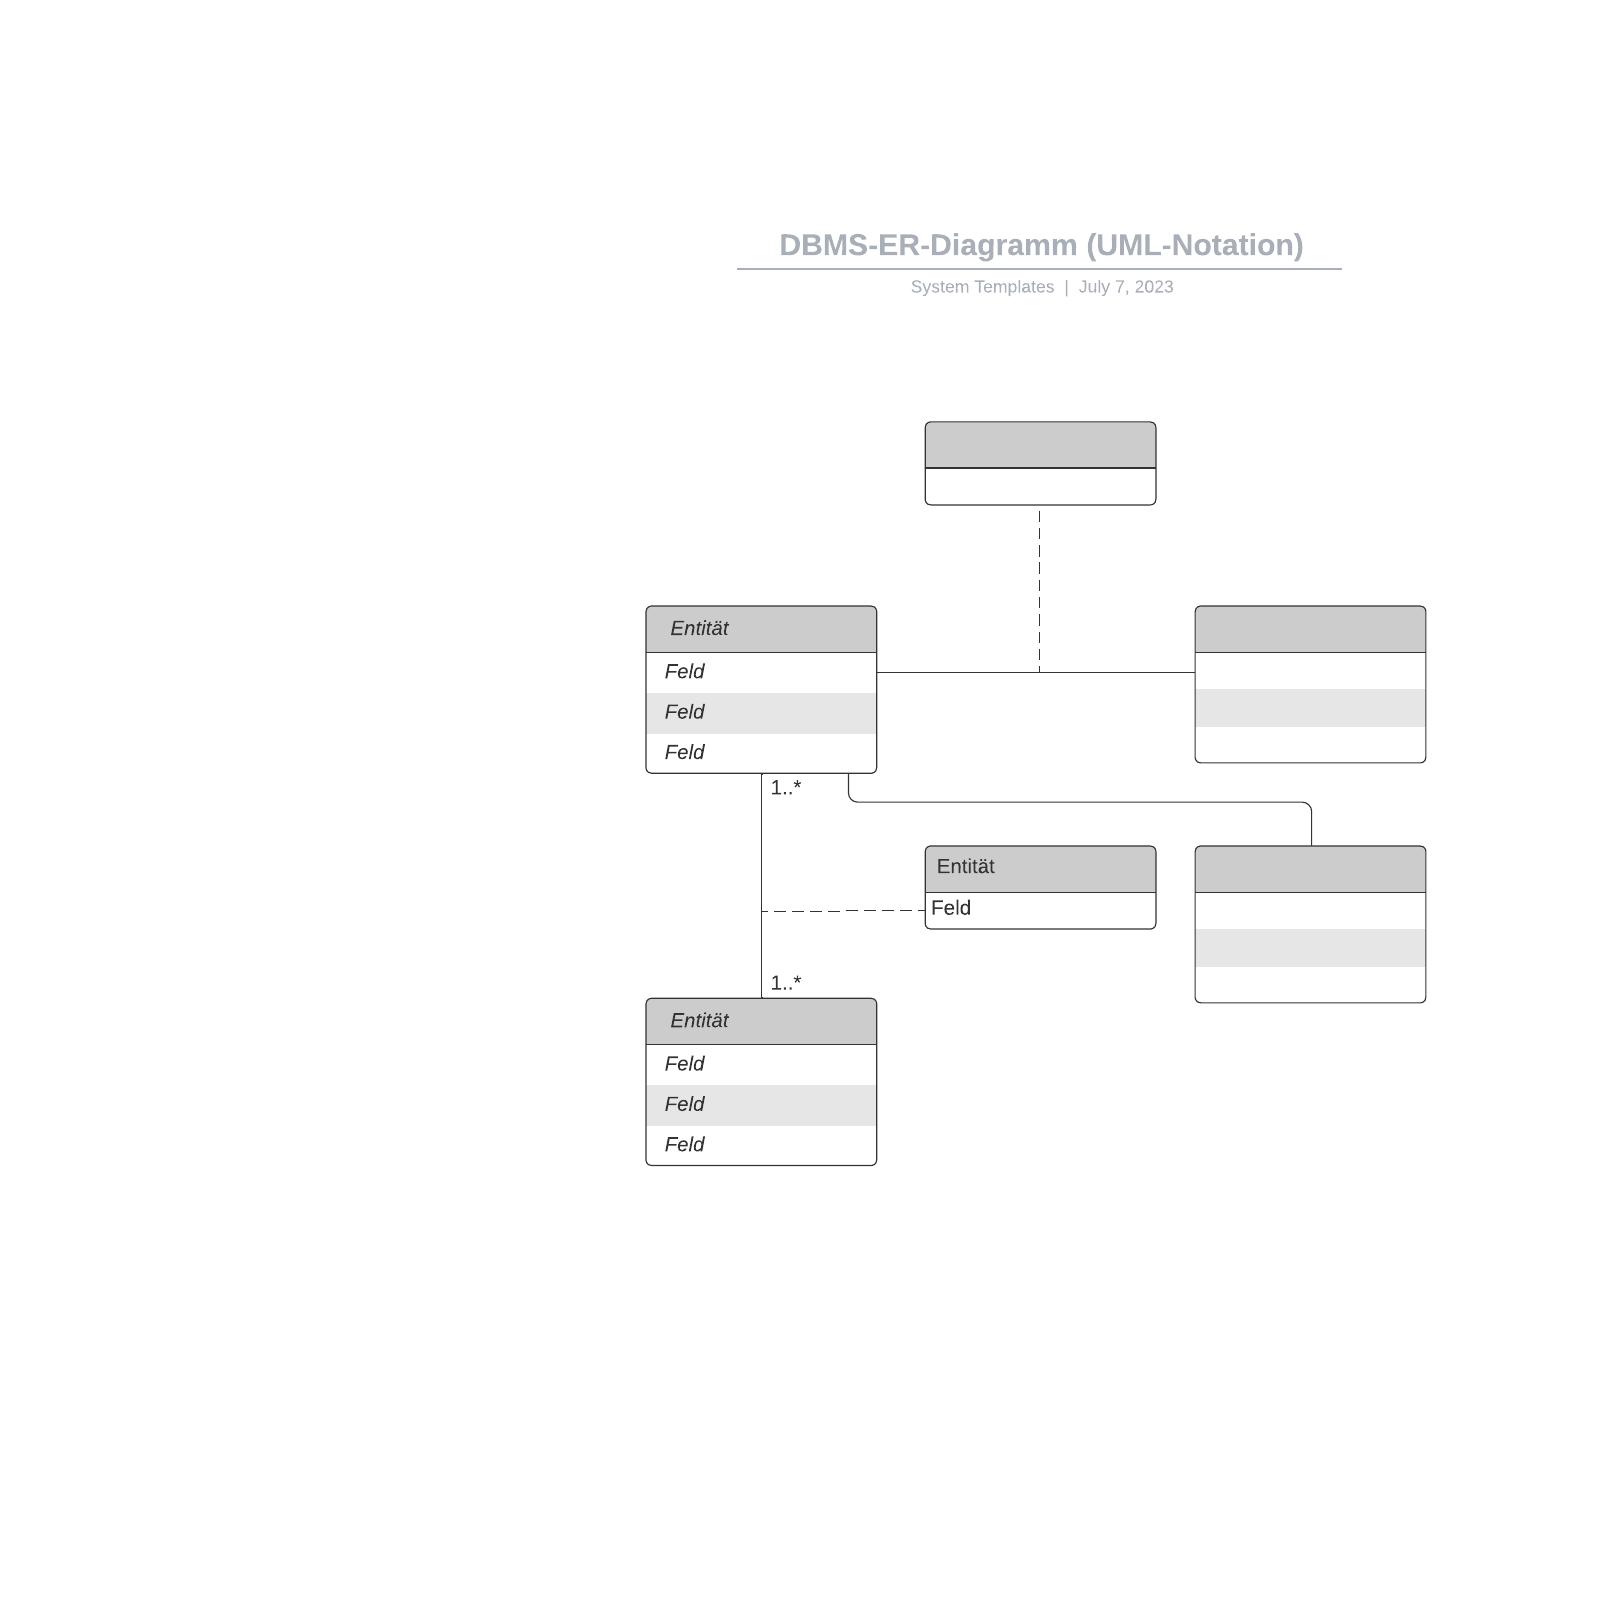 DBMS-ER-Diagramm-Vorlage (UML-Notation)